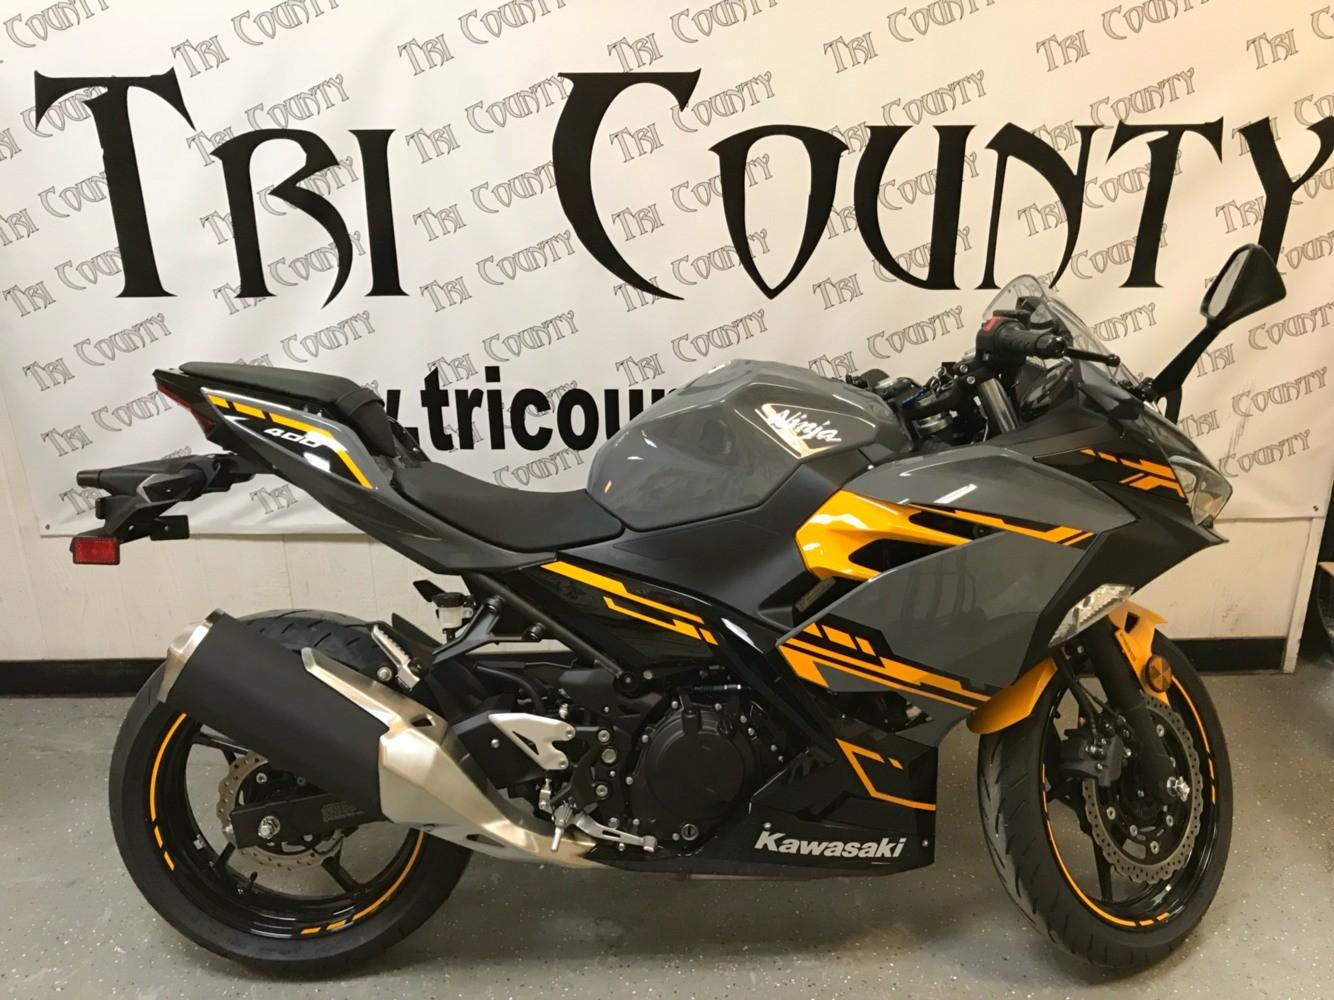 2018 Kawasaki Ninja 400 Abs Motorcycles Petersburg West Virginia